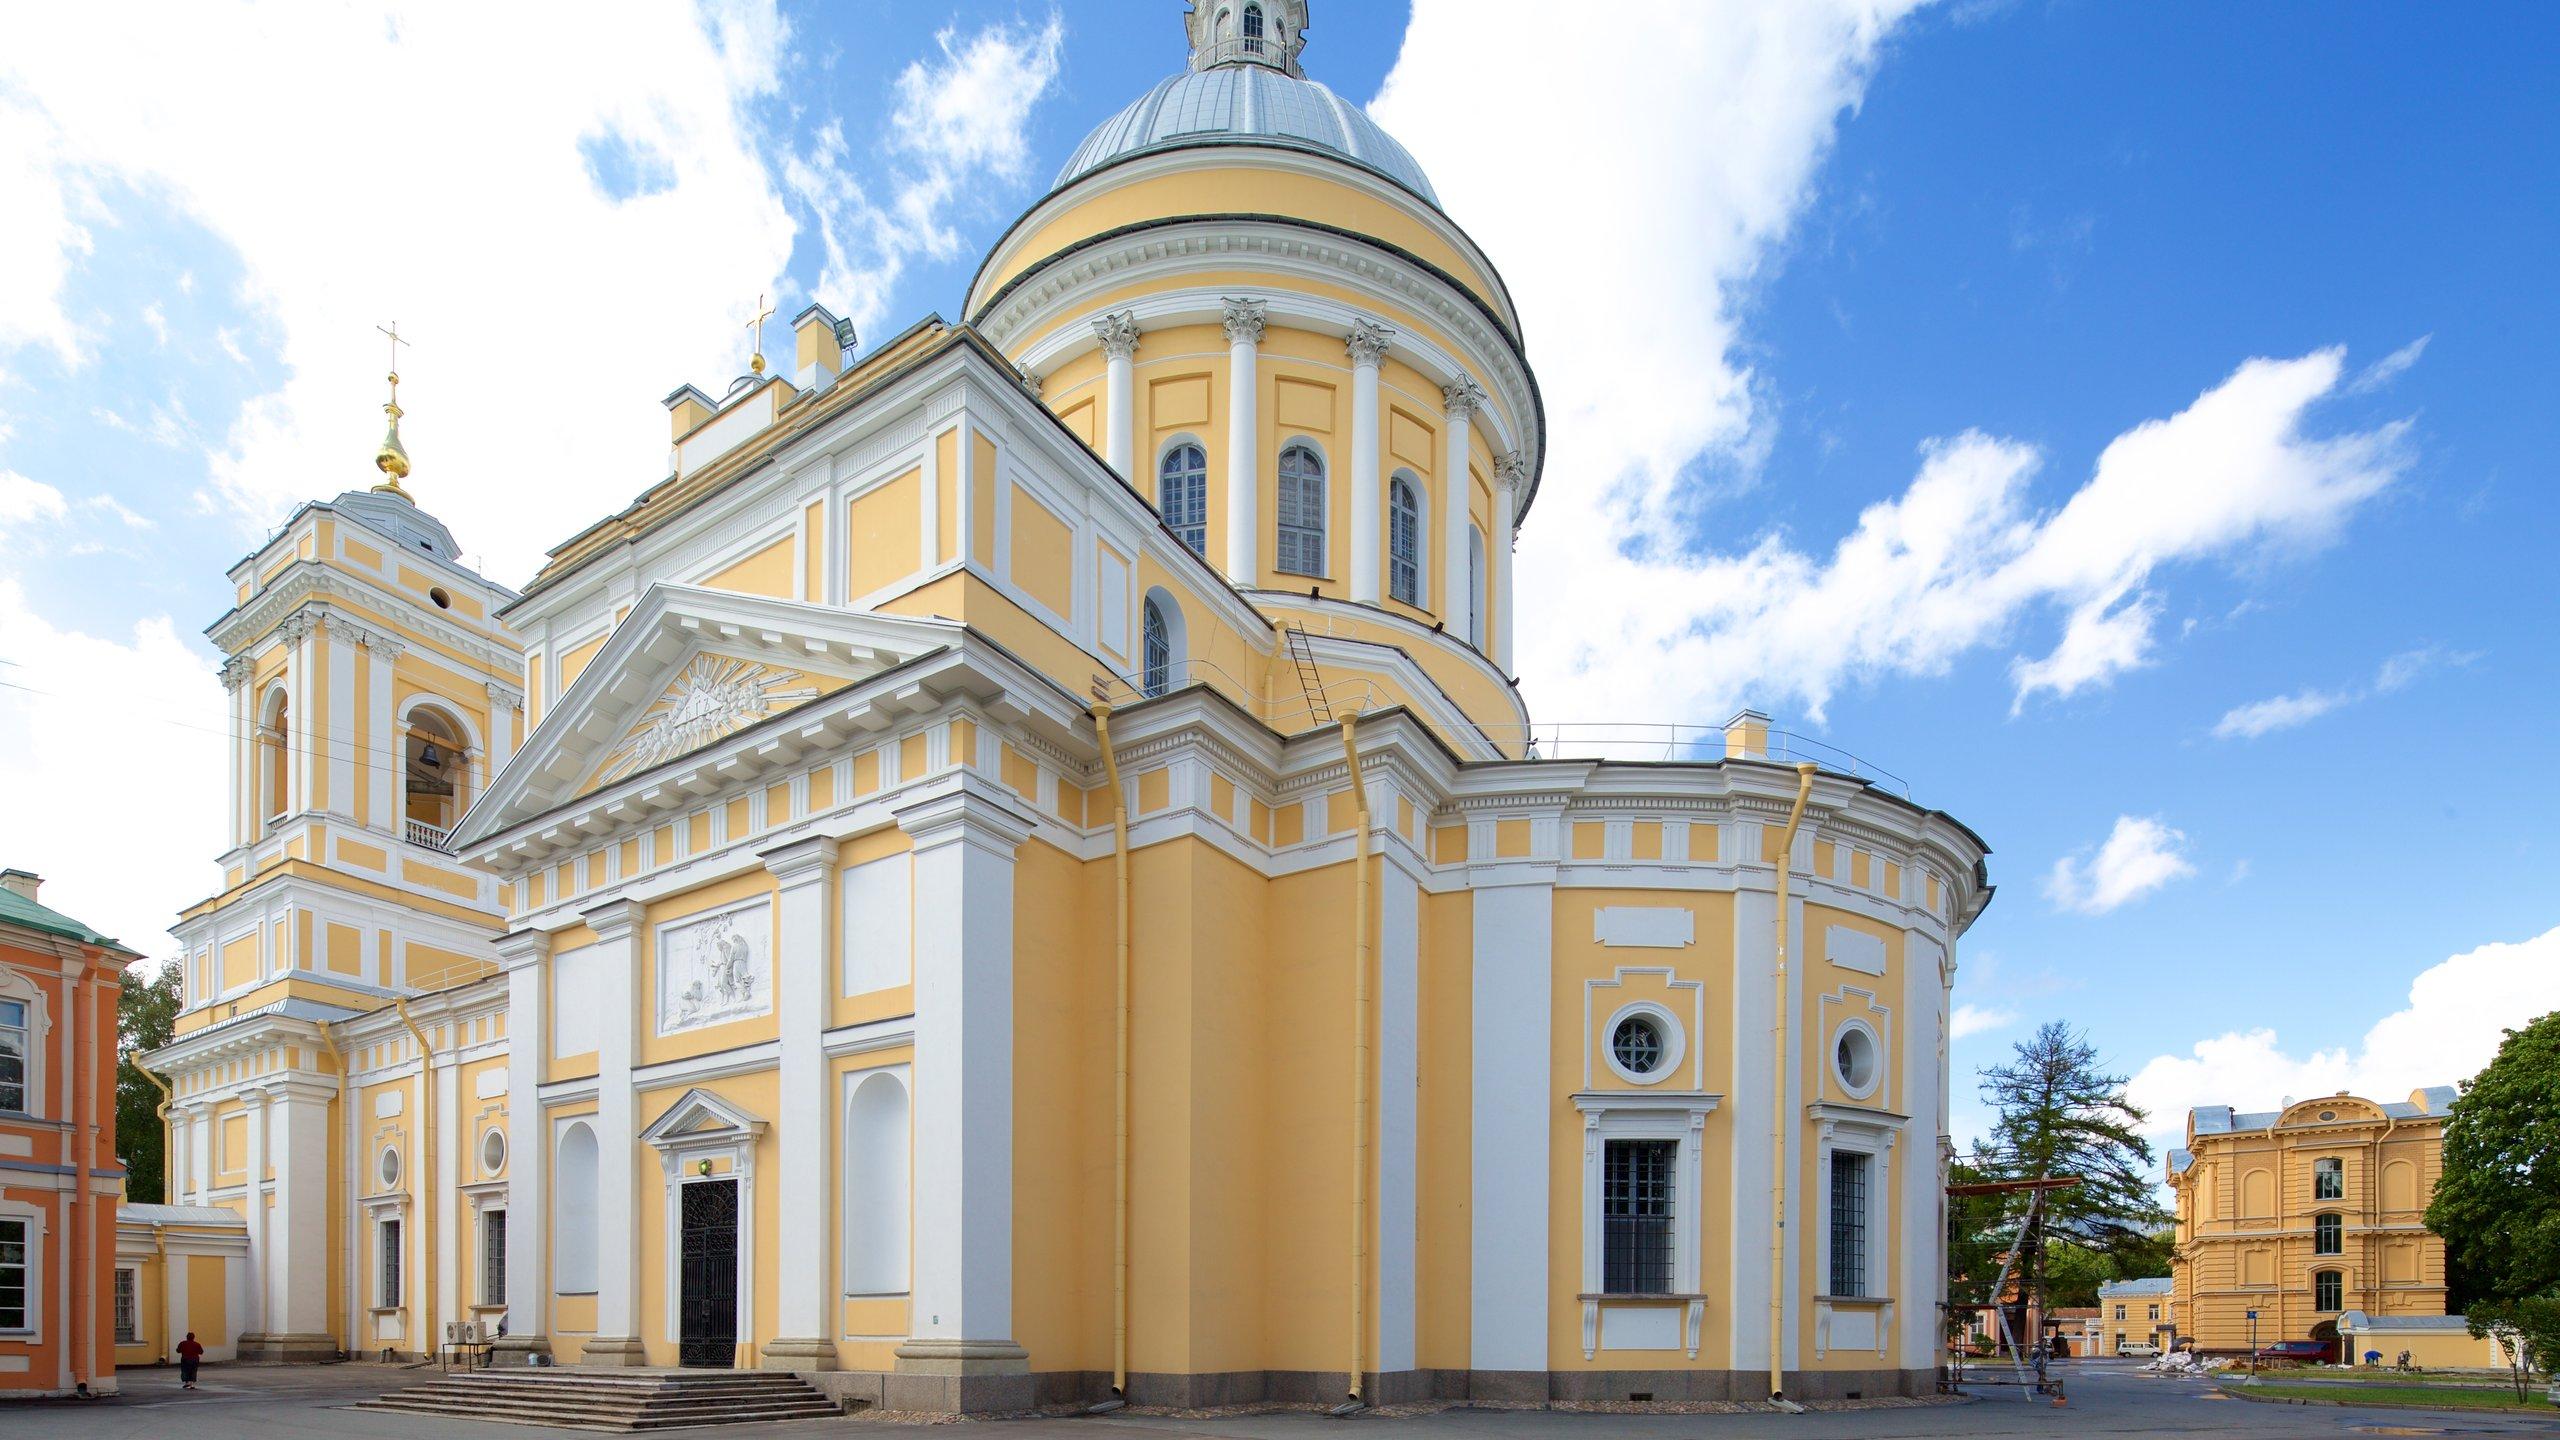 Ligovka Yamskaya, St. Petersburg, Saint Petersburg, Russia